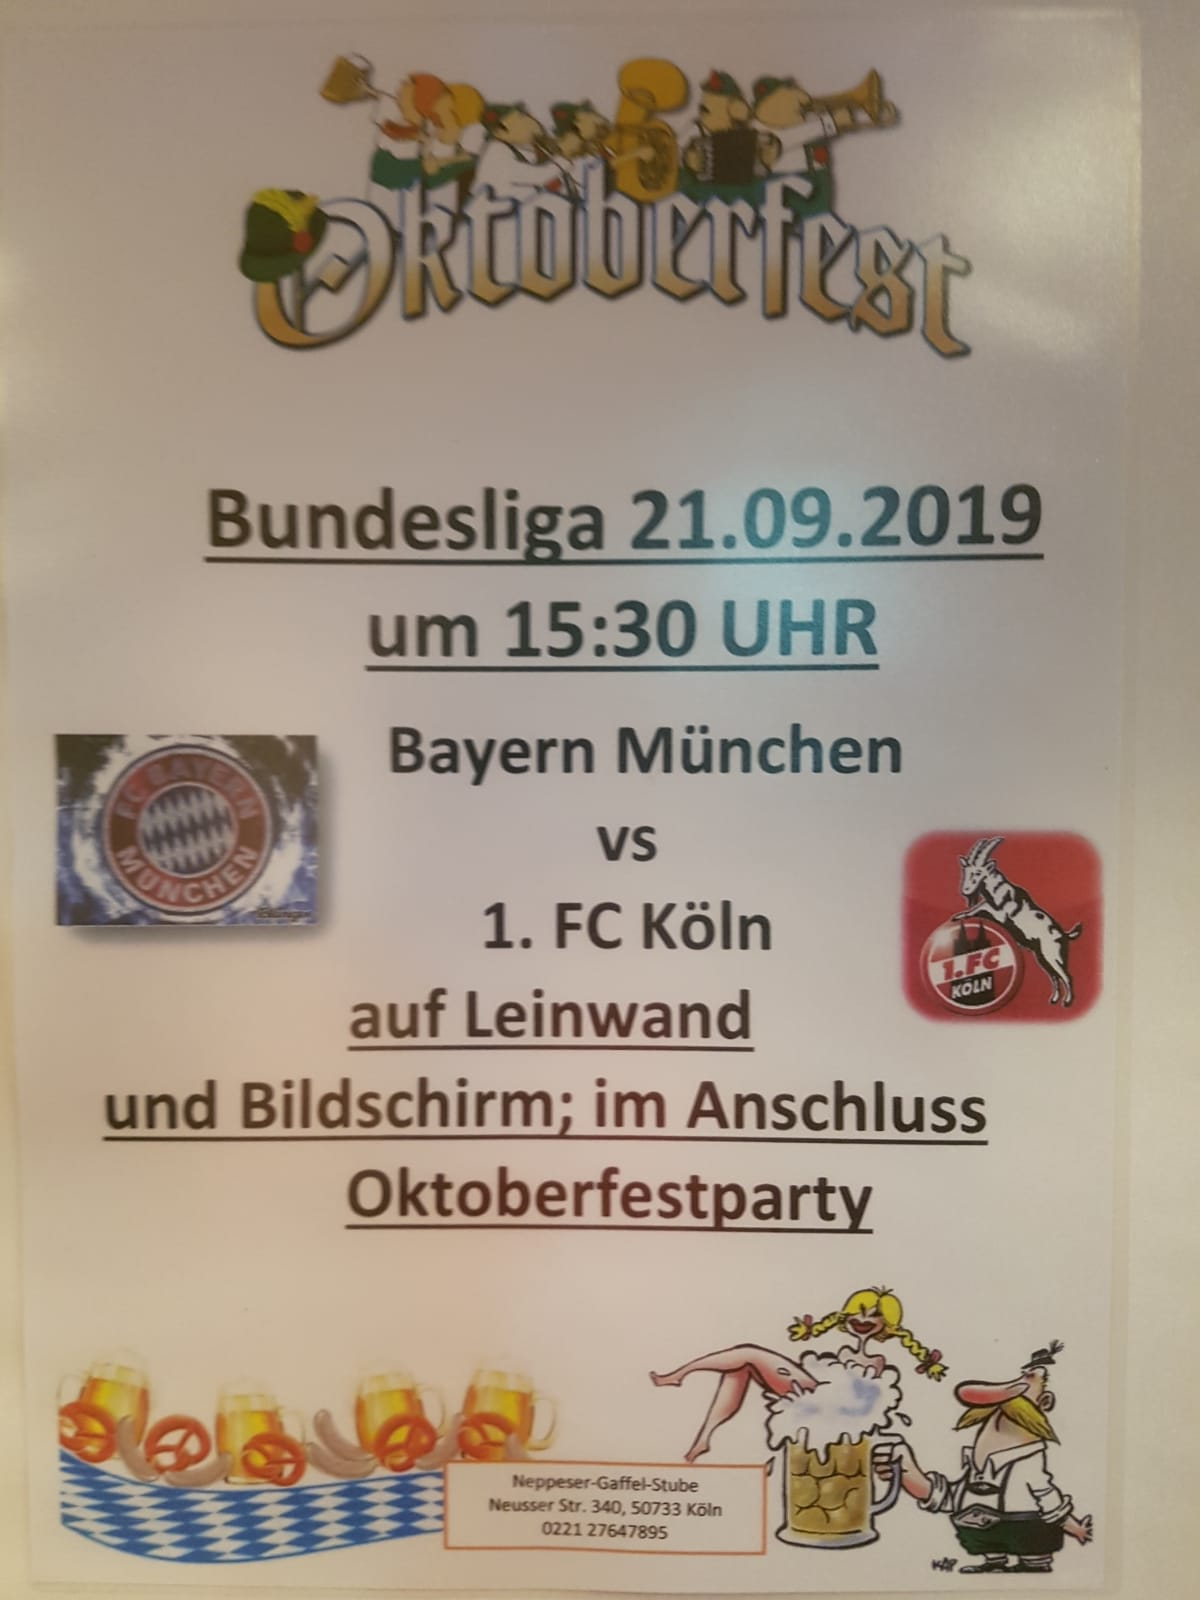 21.09.2019 Oktoberfest – Bundesliga Spiel Bayern München vs. 1. FC Köln ab 15:30